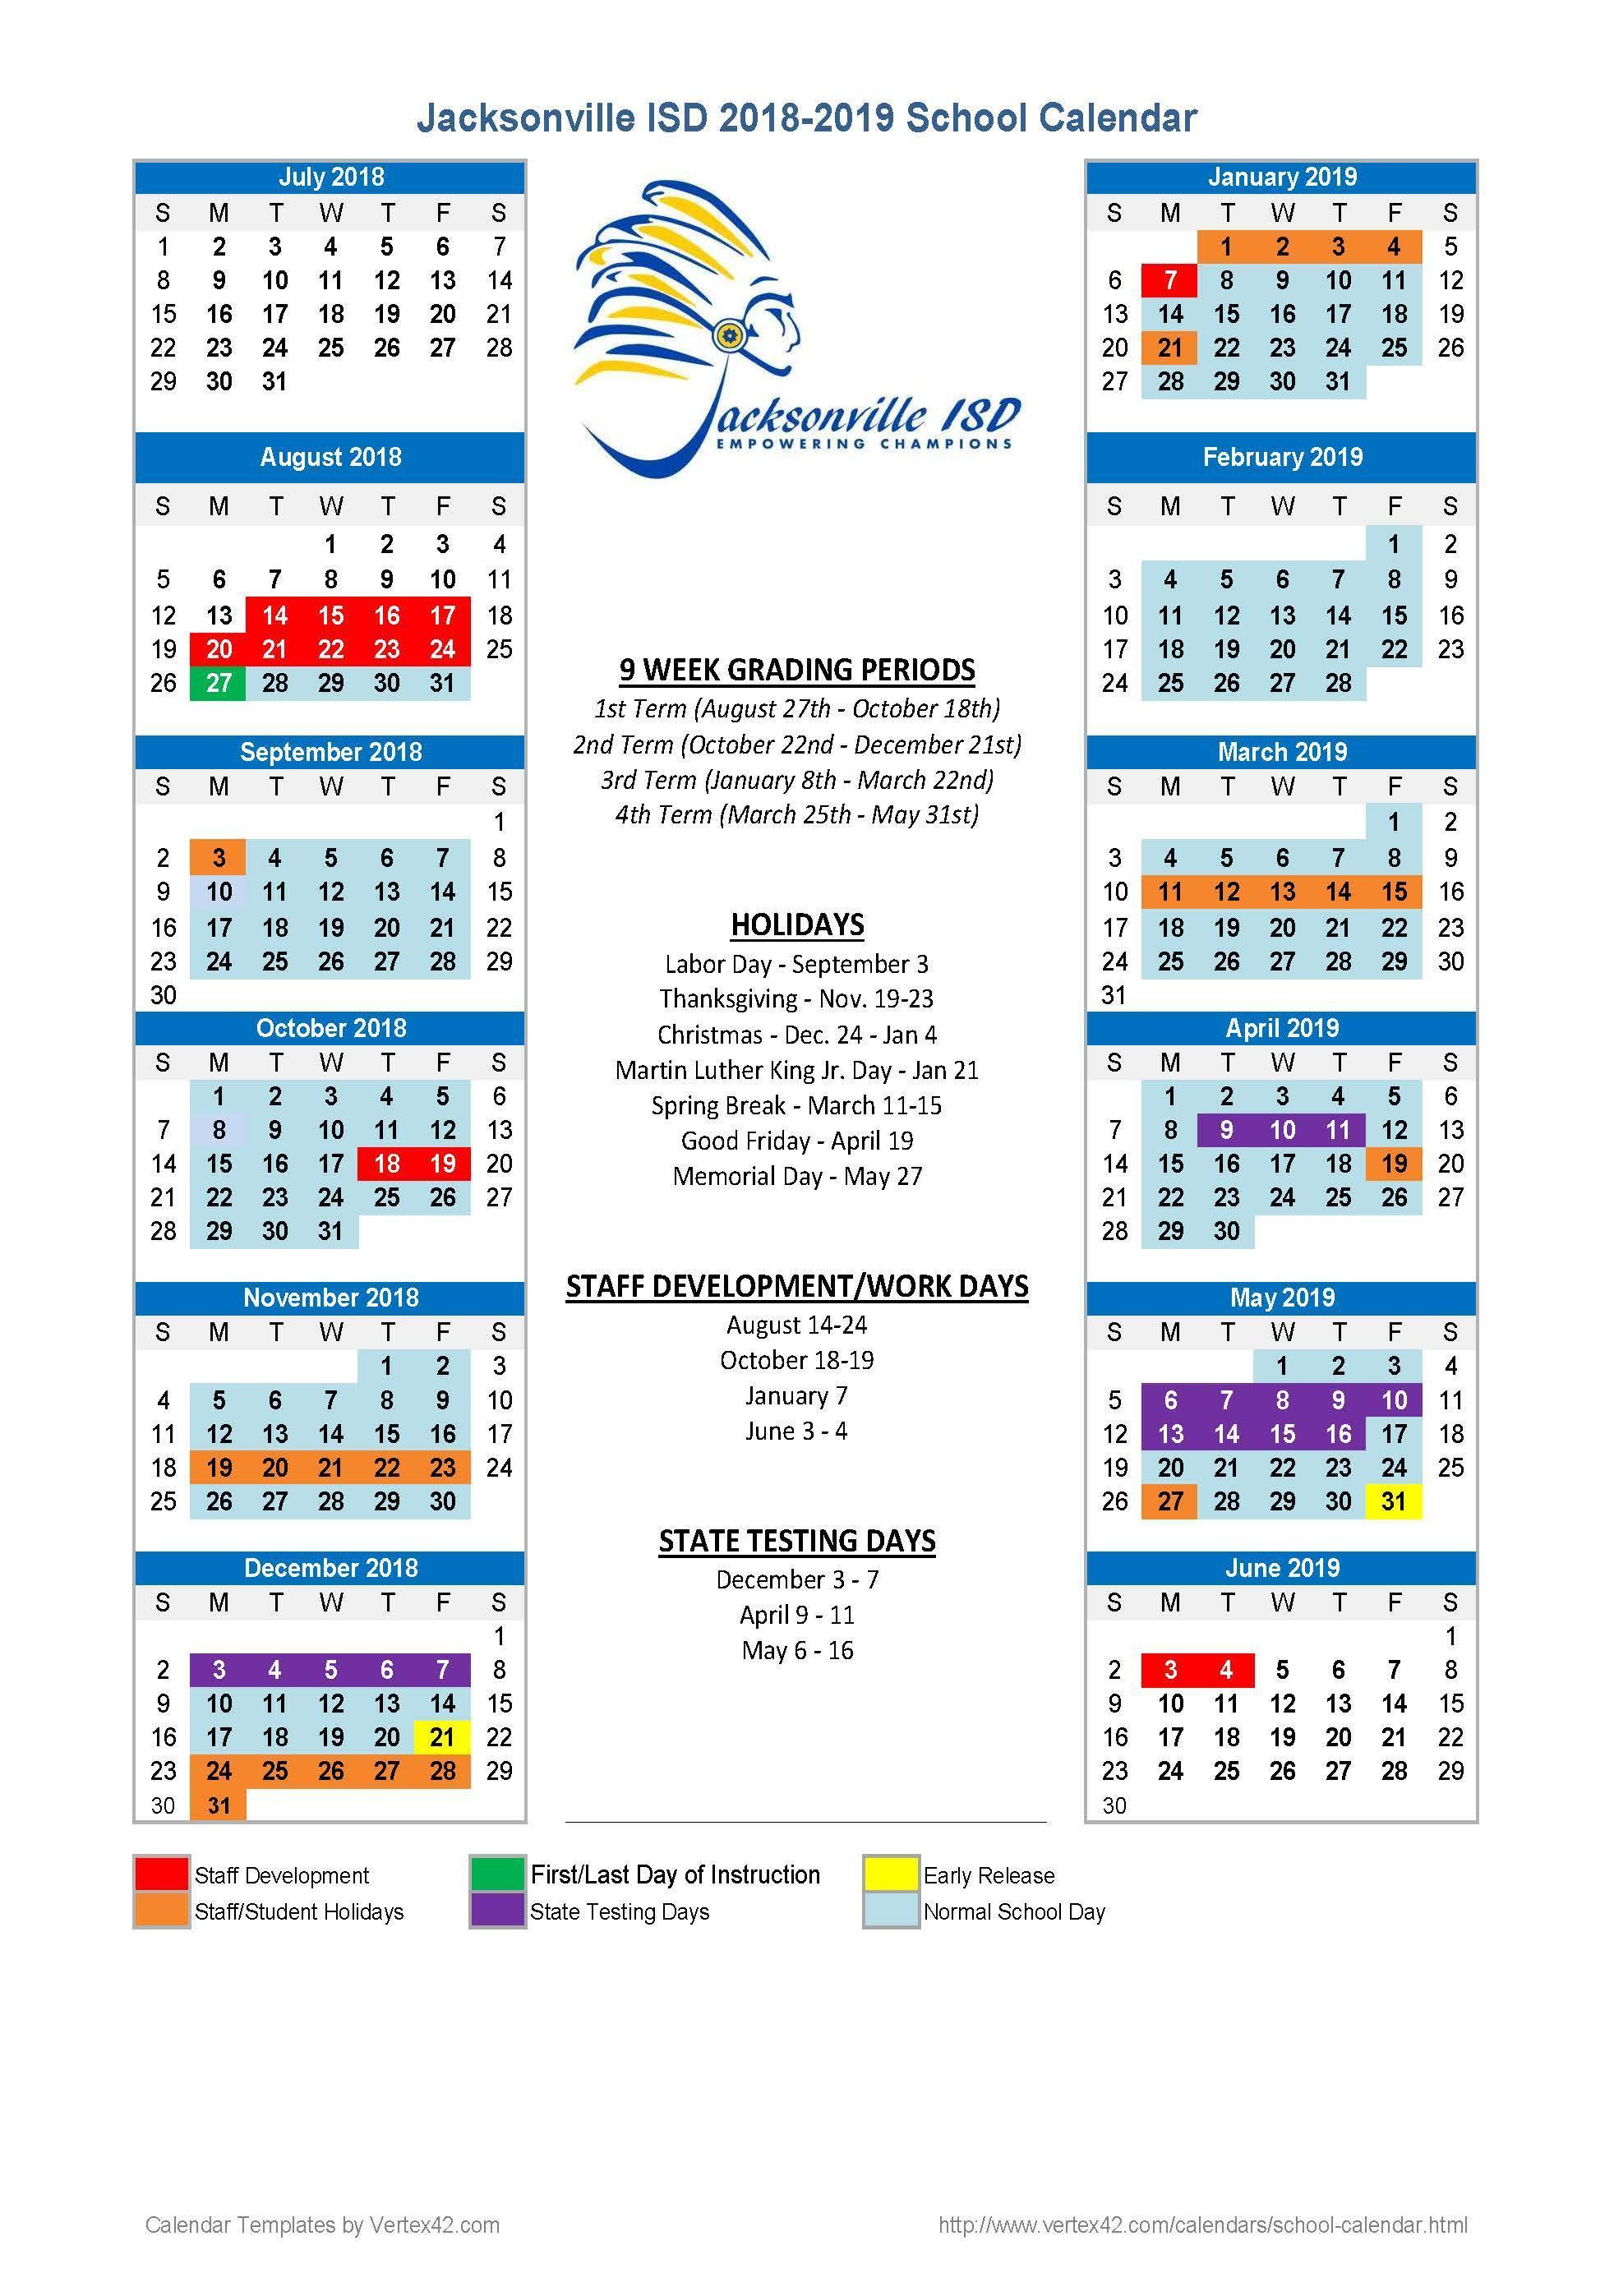 School calendar for 2018-19